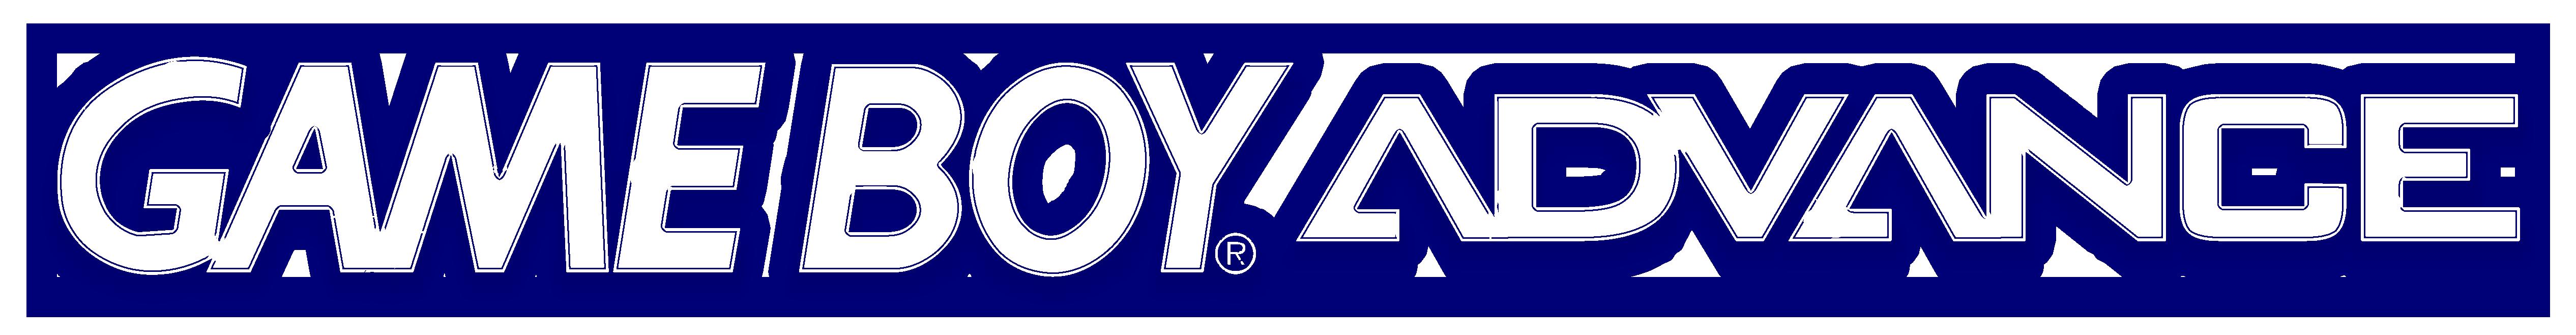 Gameboy Advance Logos